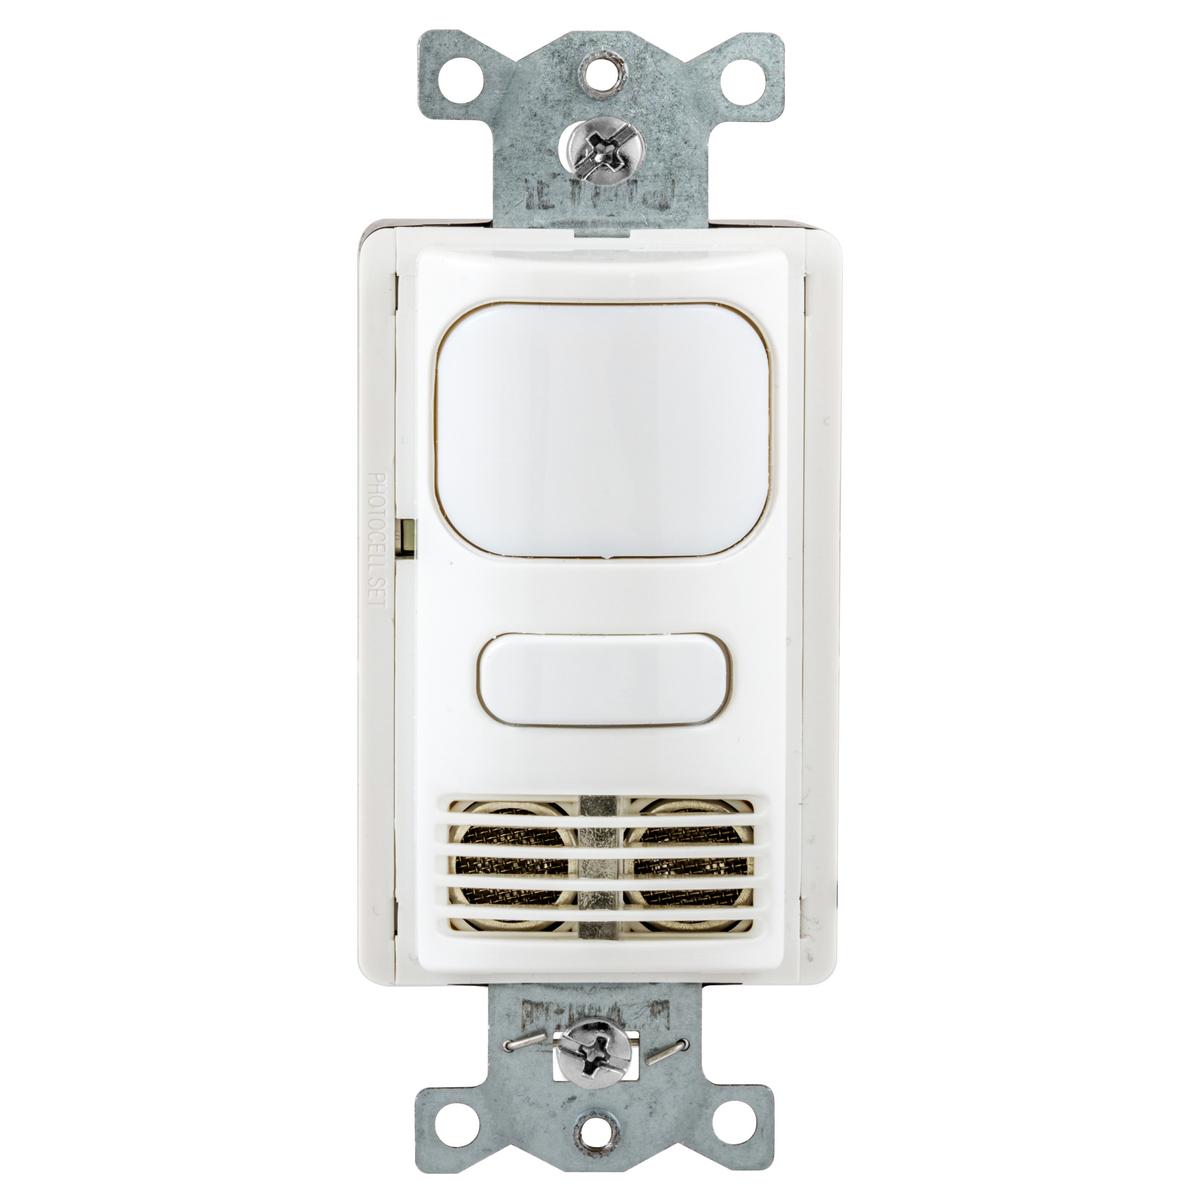 Wiring Device-KellemsAD2000W1